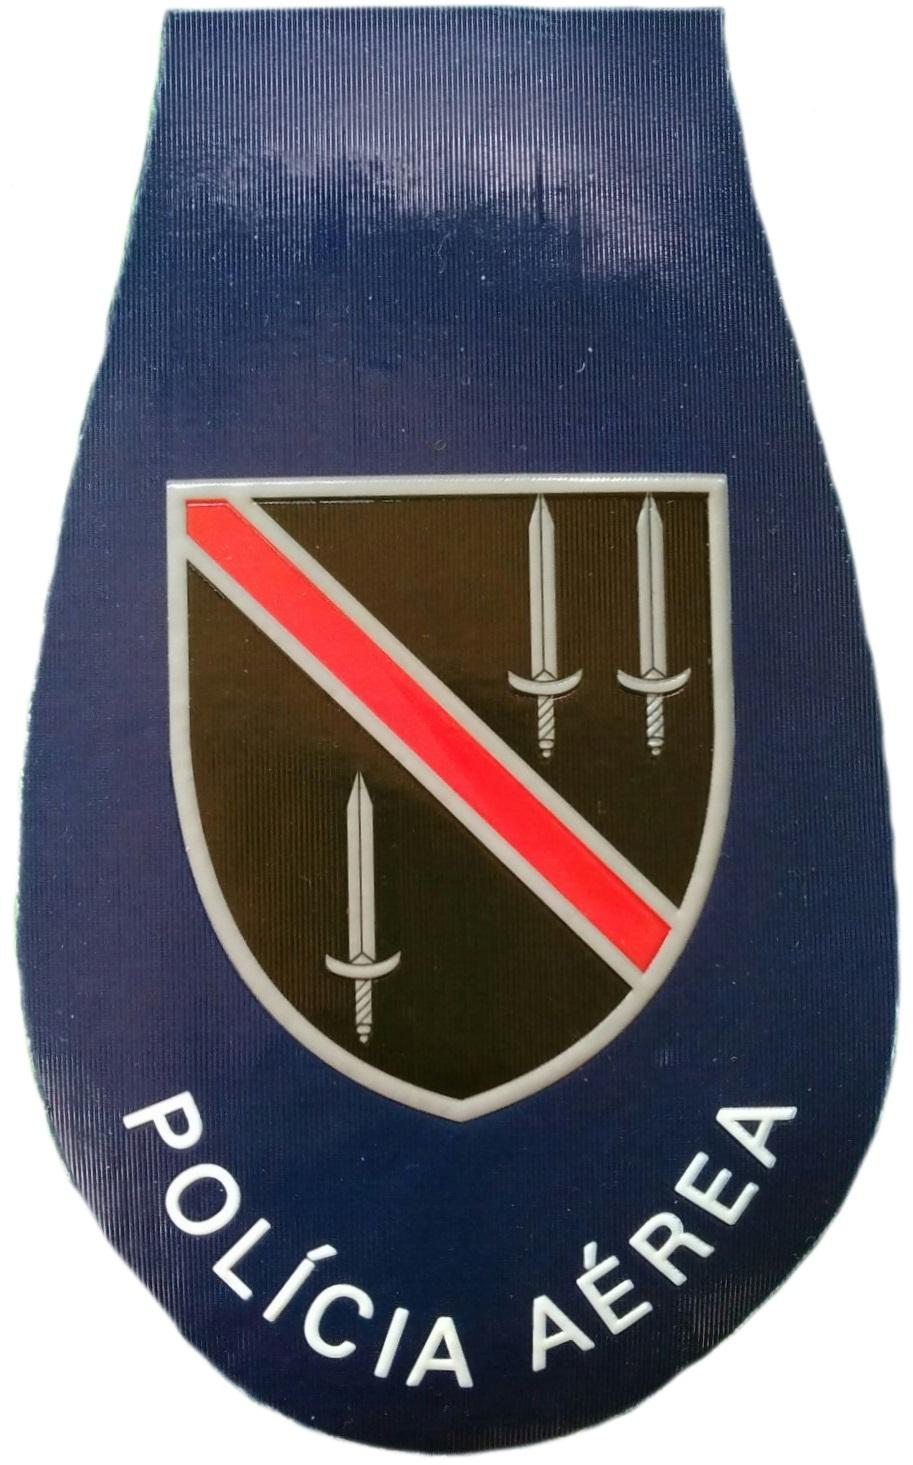 Policía de orden público de Angola policía aérea helicópteros parche insignia emblema distintivo